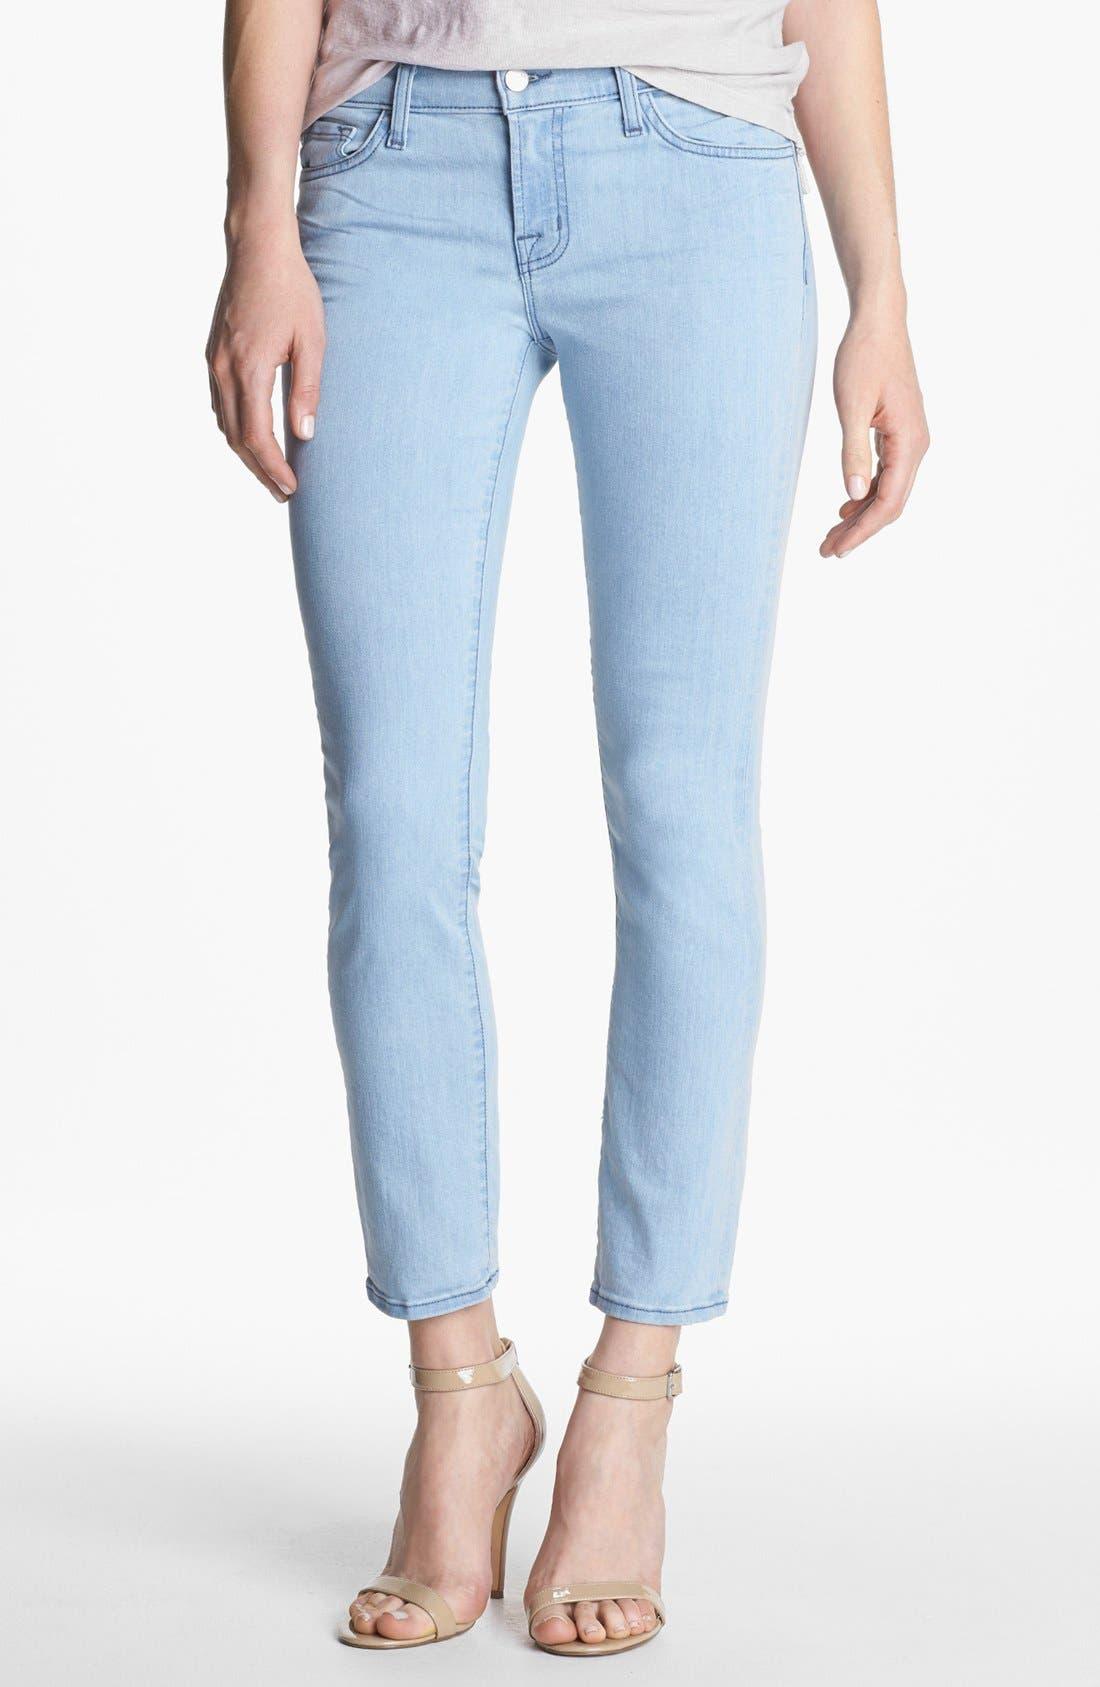 Alternate Image 1 Selected - J Brand Pencil Leg Stretch Jeans (Beautiful Blue)